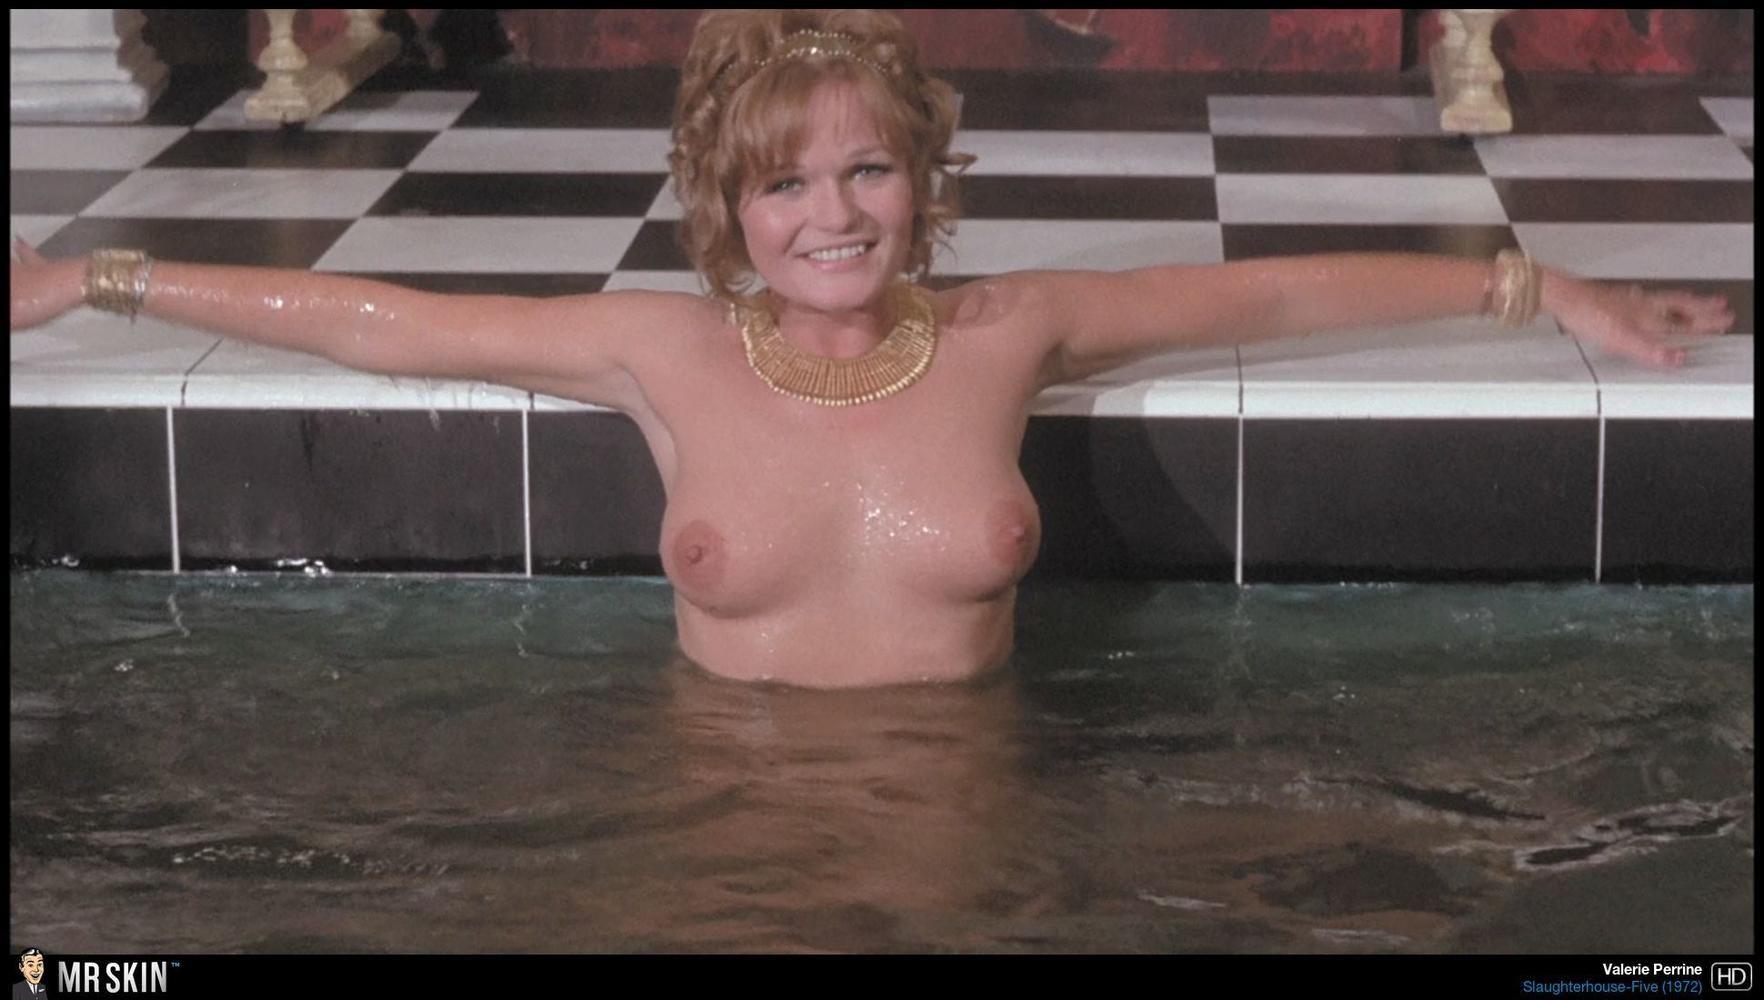 Boobs Valerie Perrine Nude Picture HD